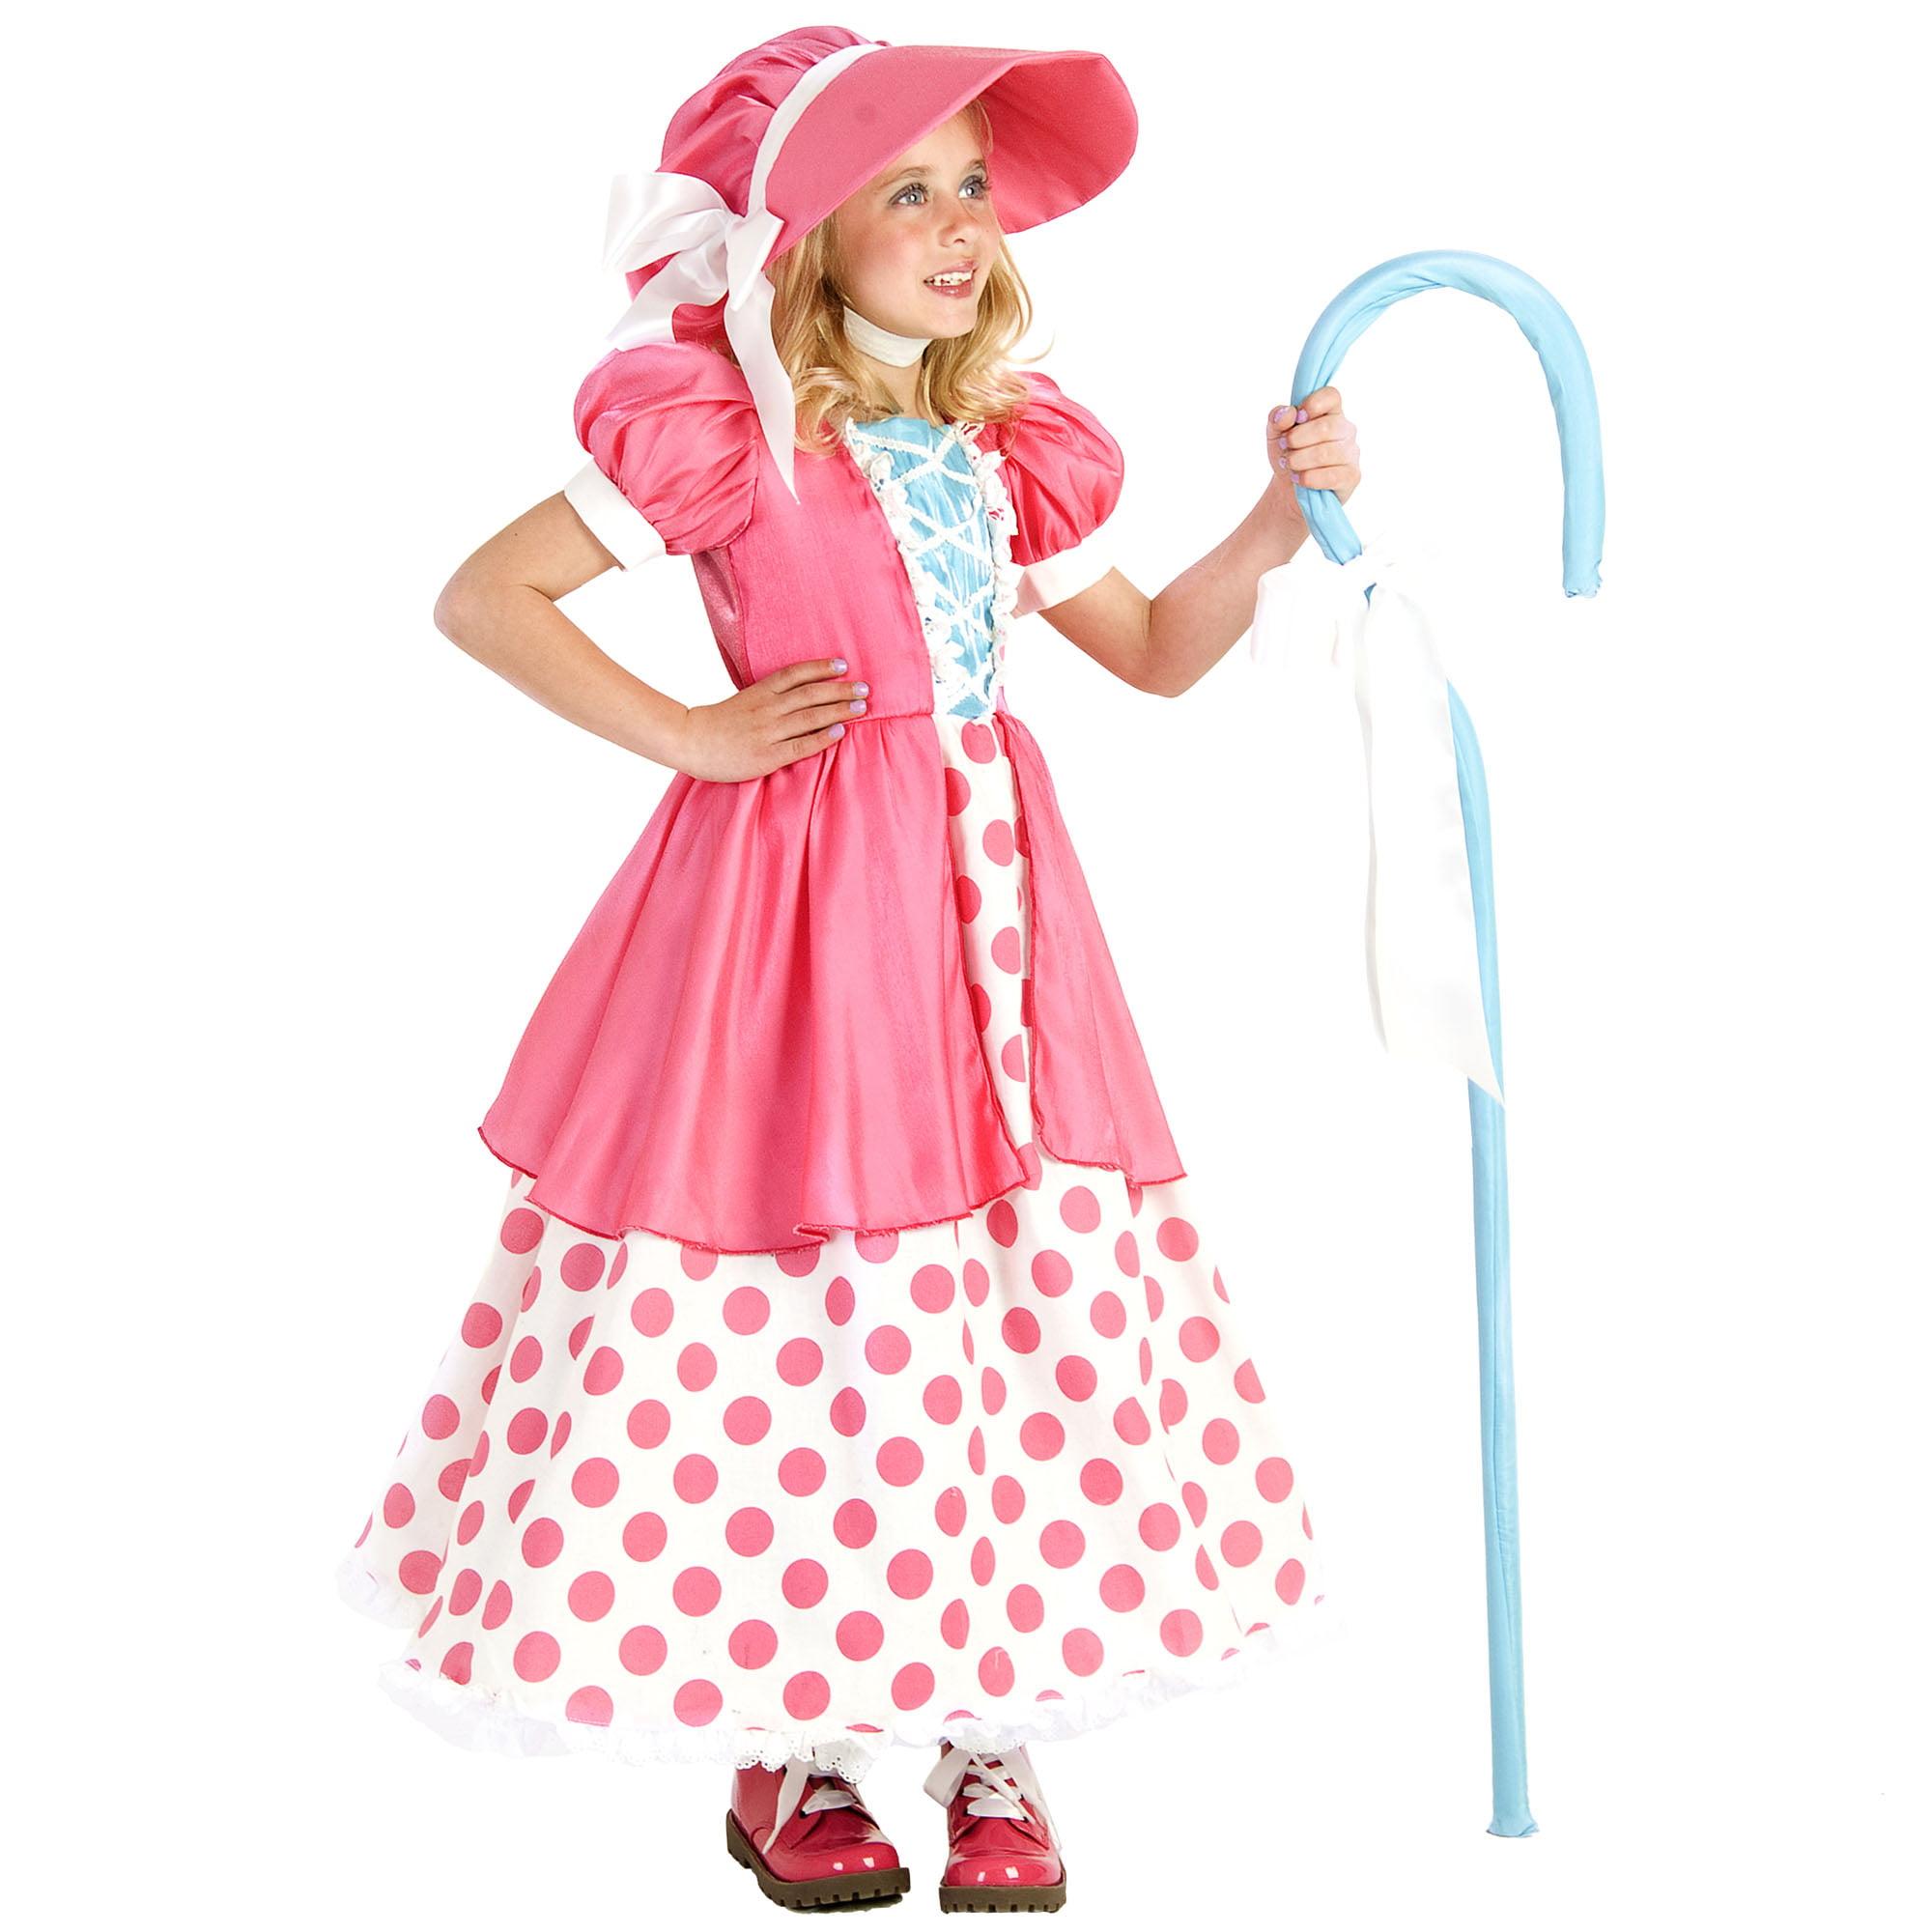 Princess paradise premium polka dot bo peep child costume Child Xs (4)